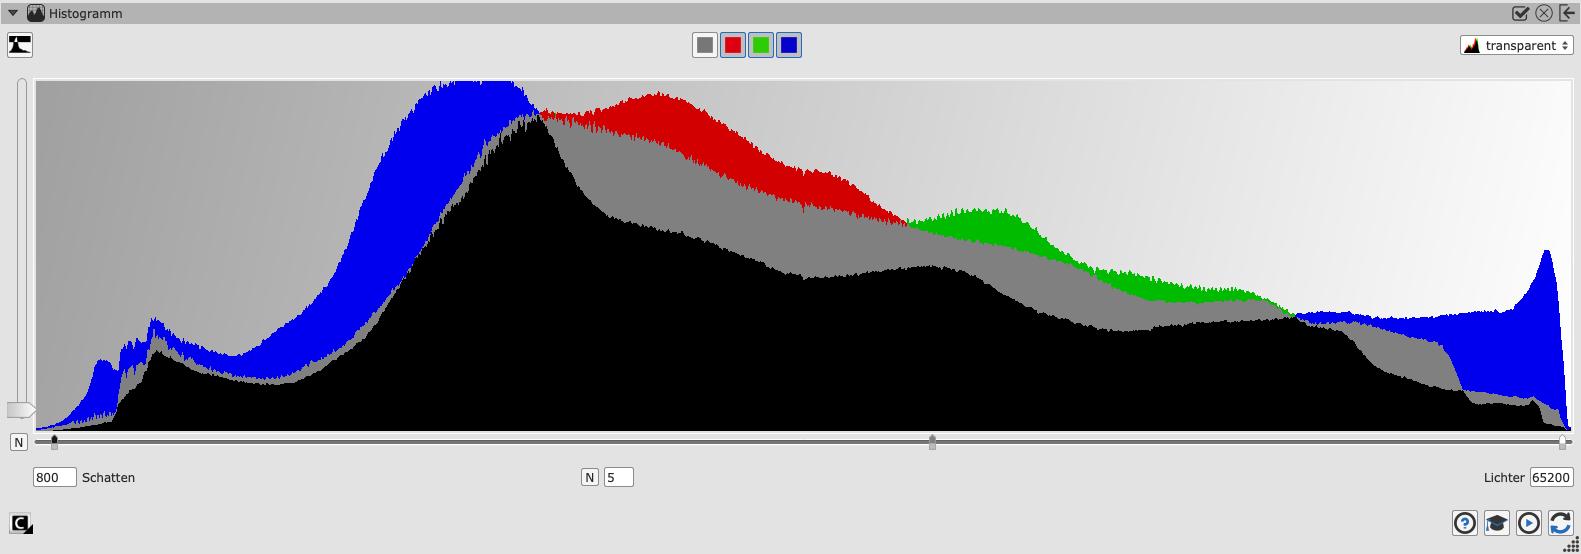 screen_wide_16bit_histogramm_de